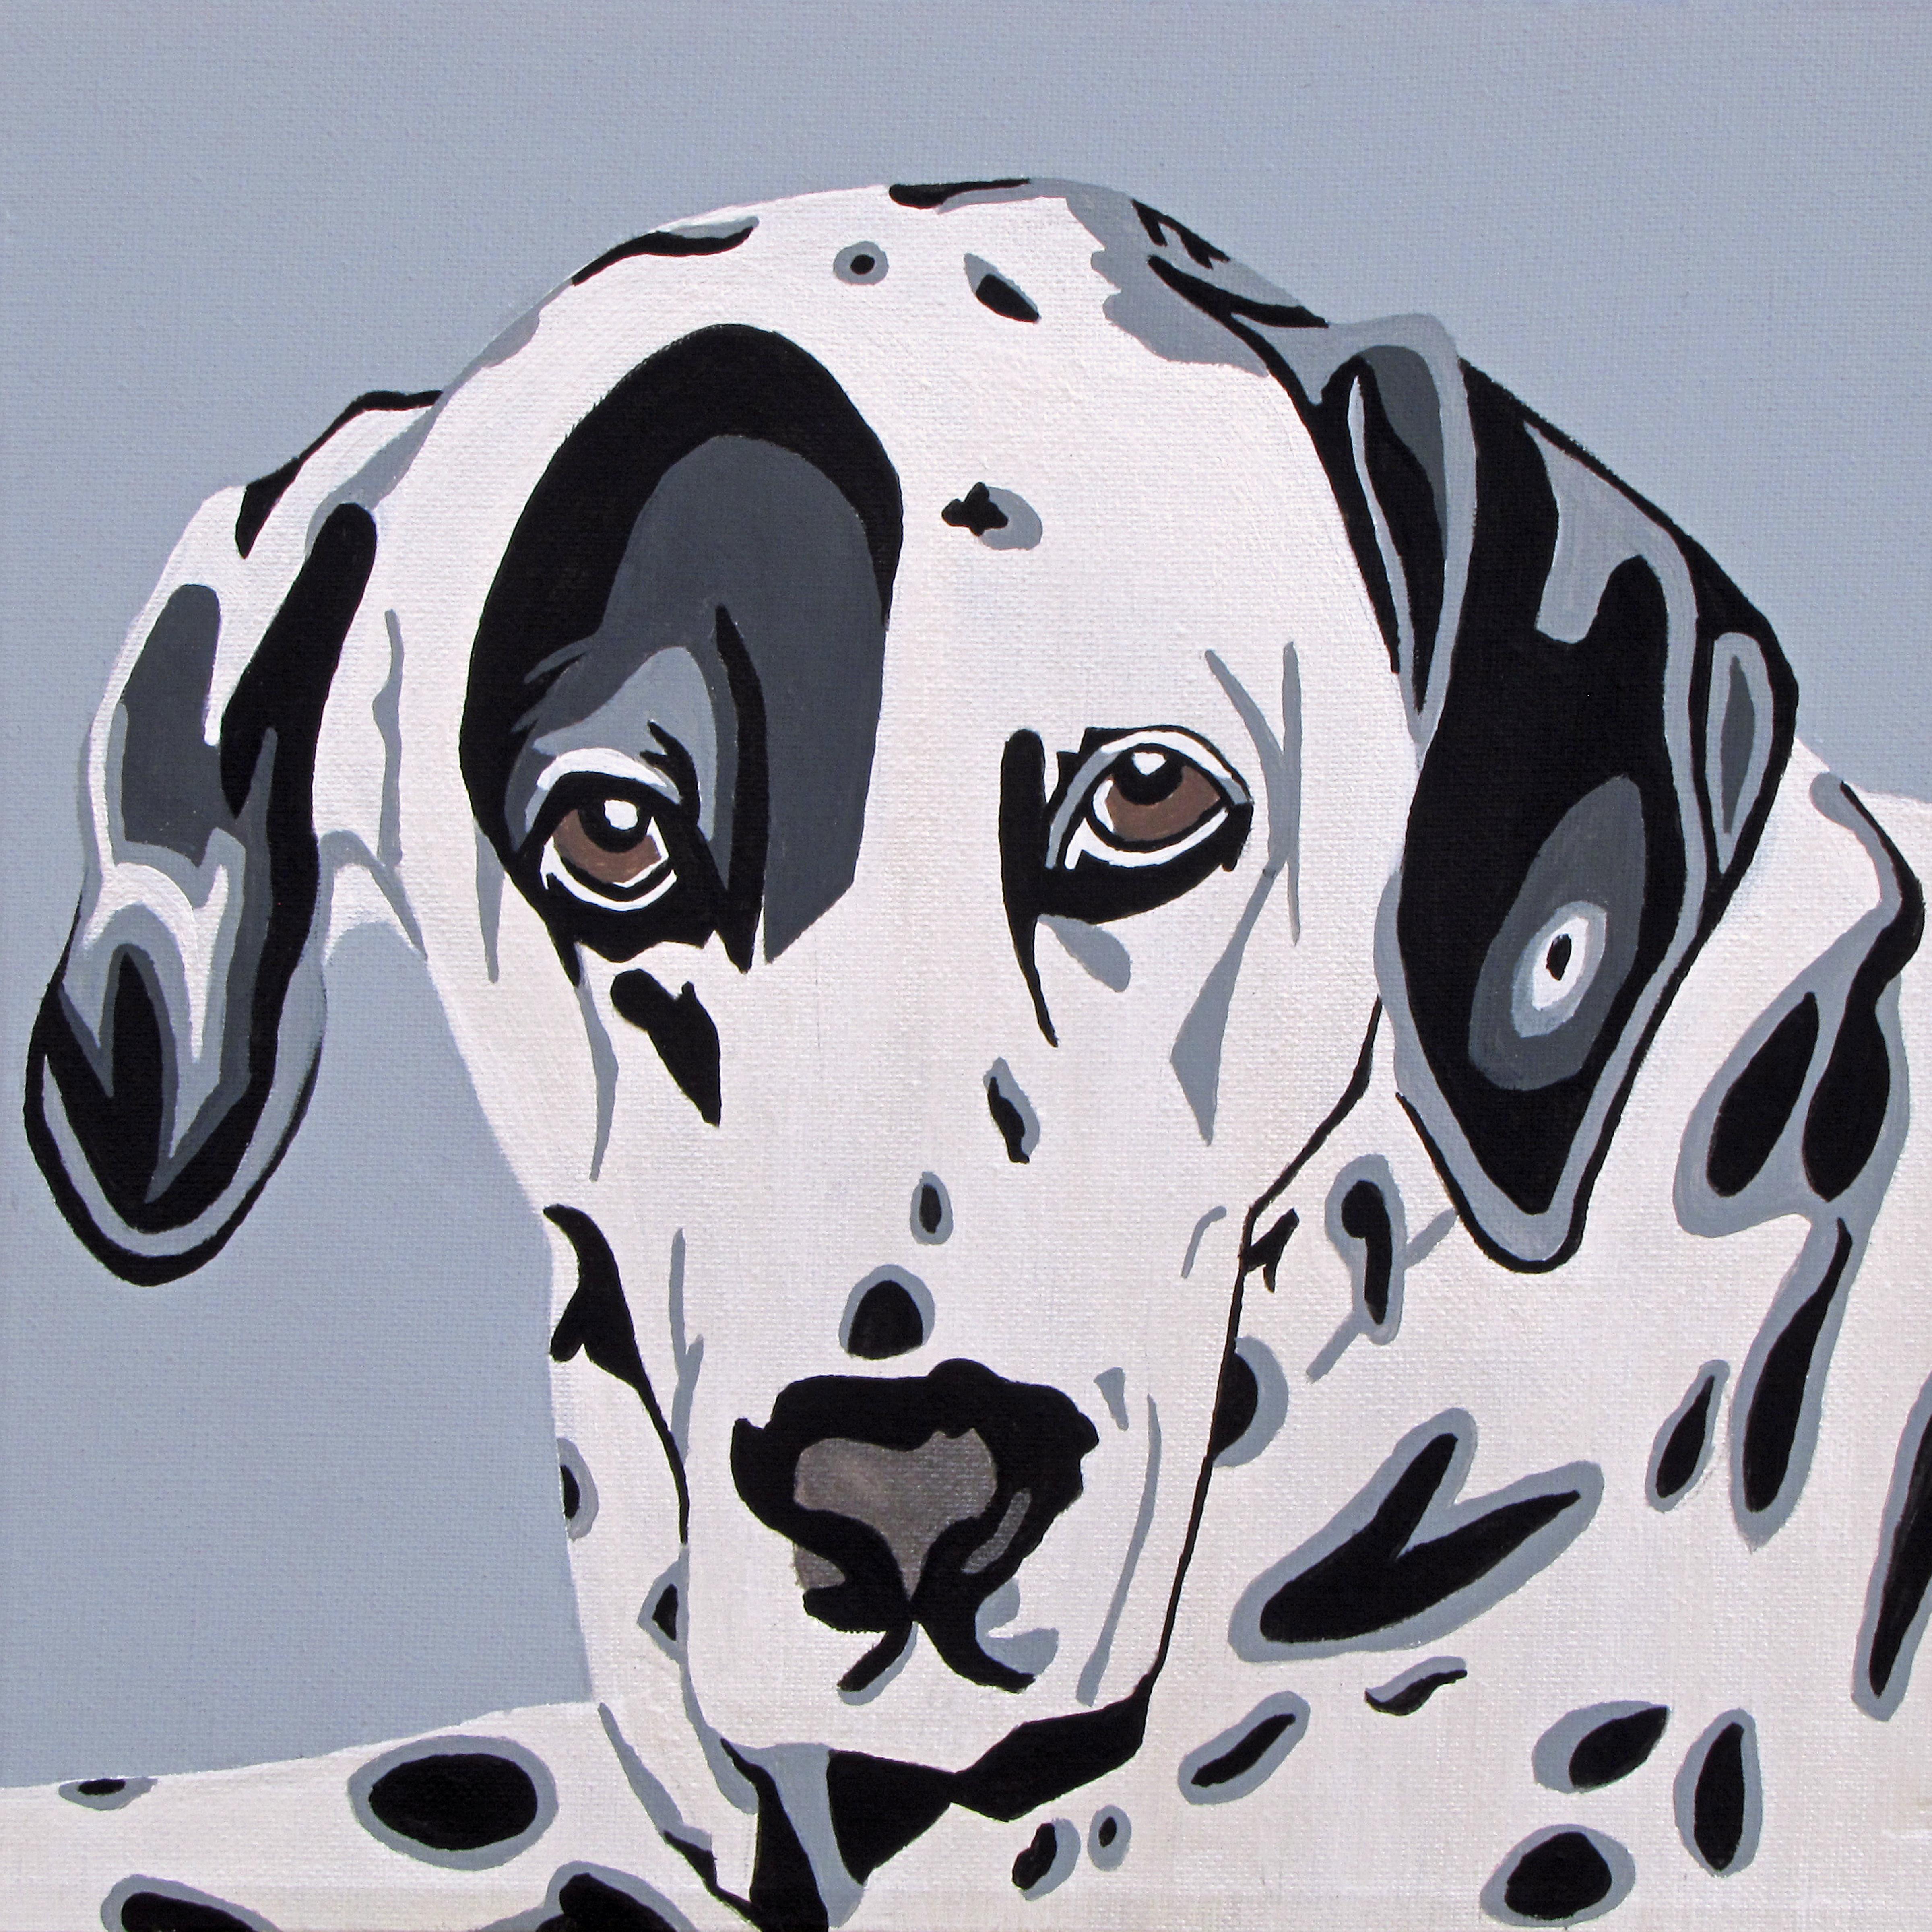 Dalmatian 2 - Slade Roberts Studio